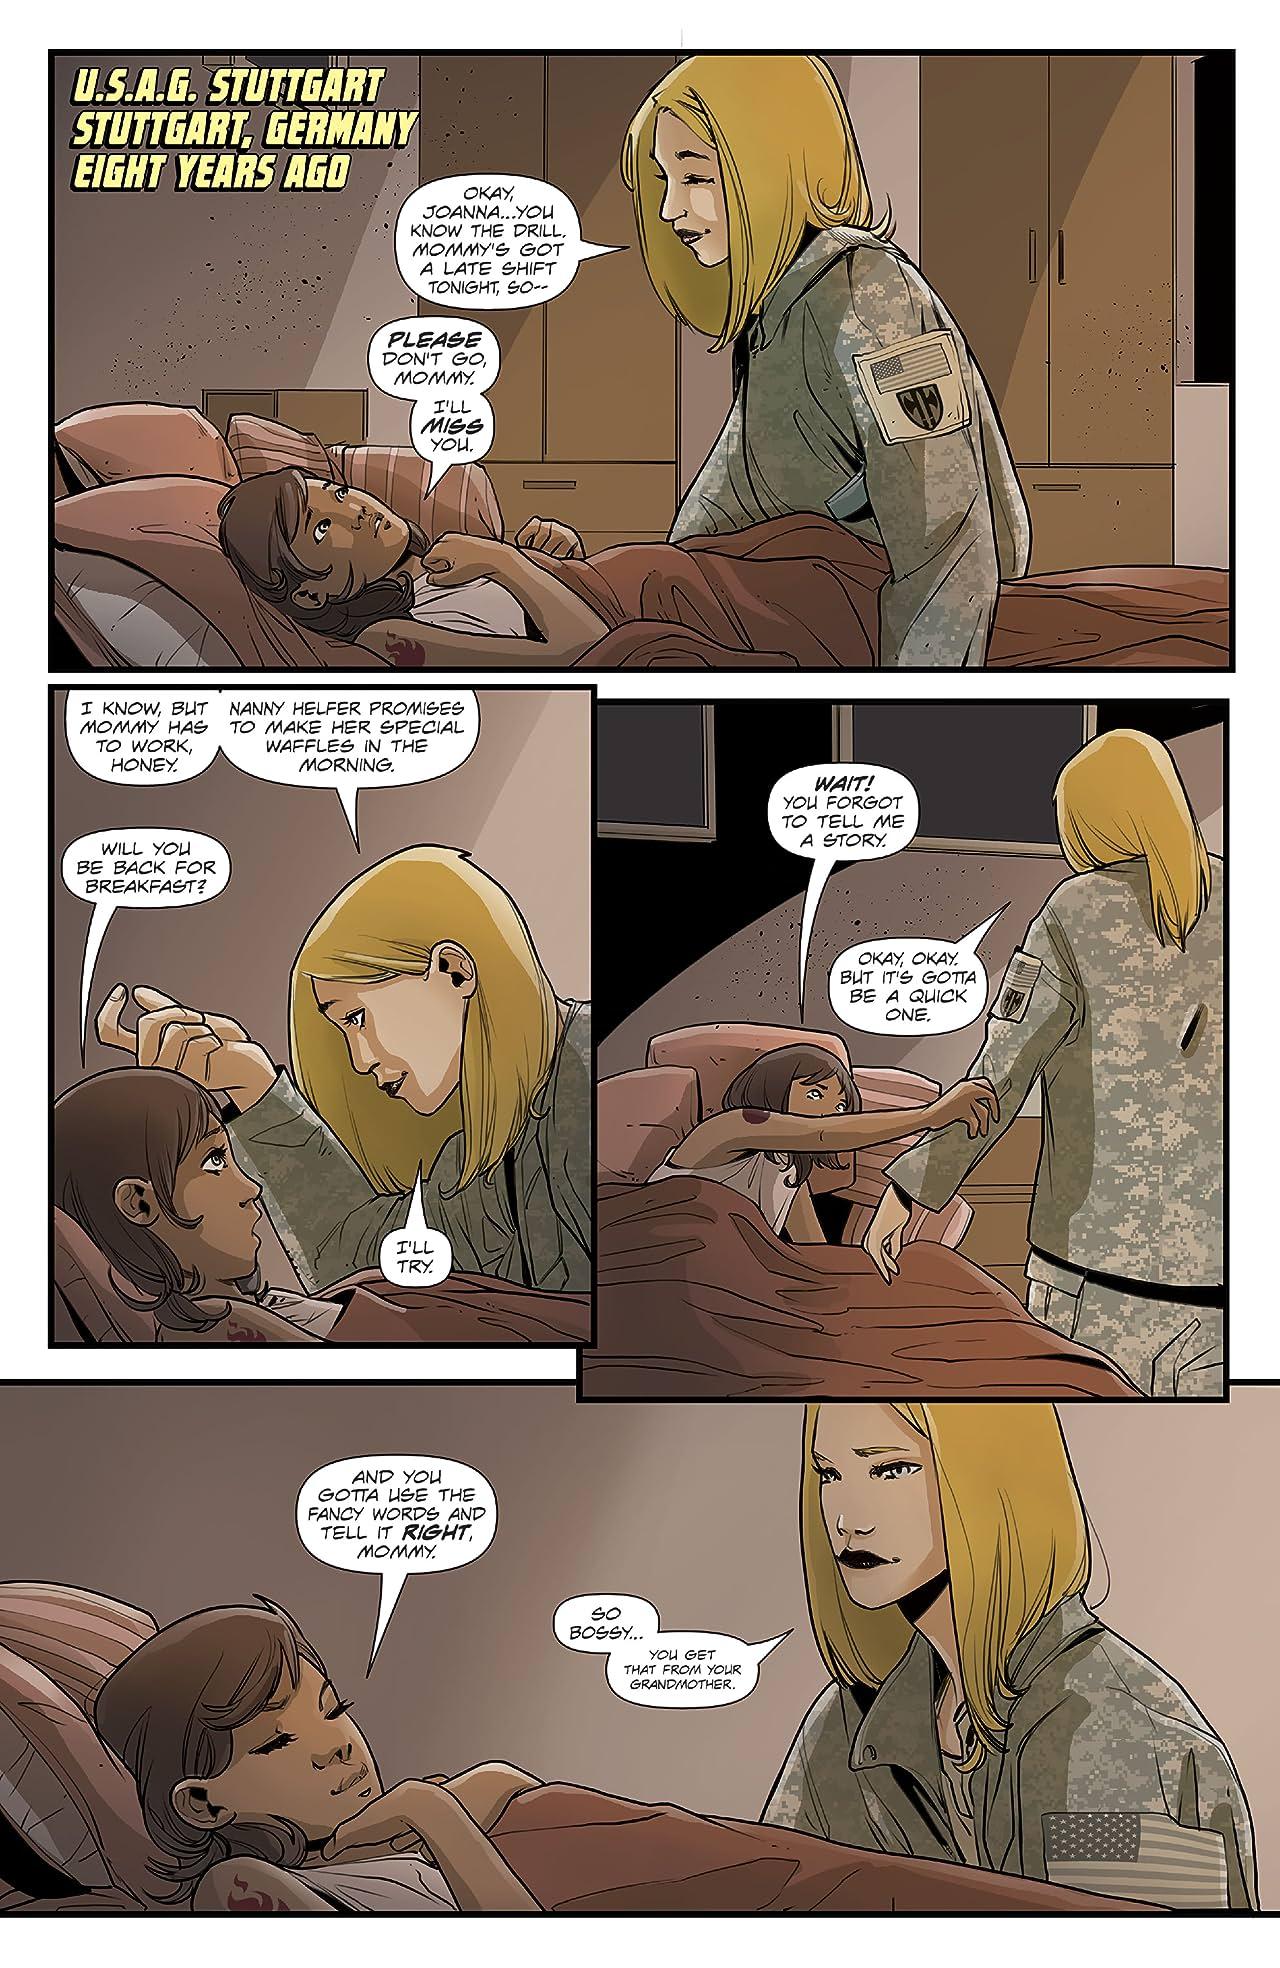 Forgotten Home Season One (comiXology Originals) #2 (of 8)